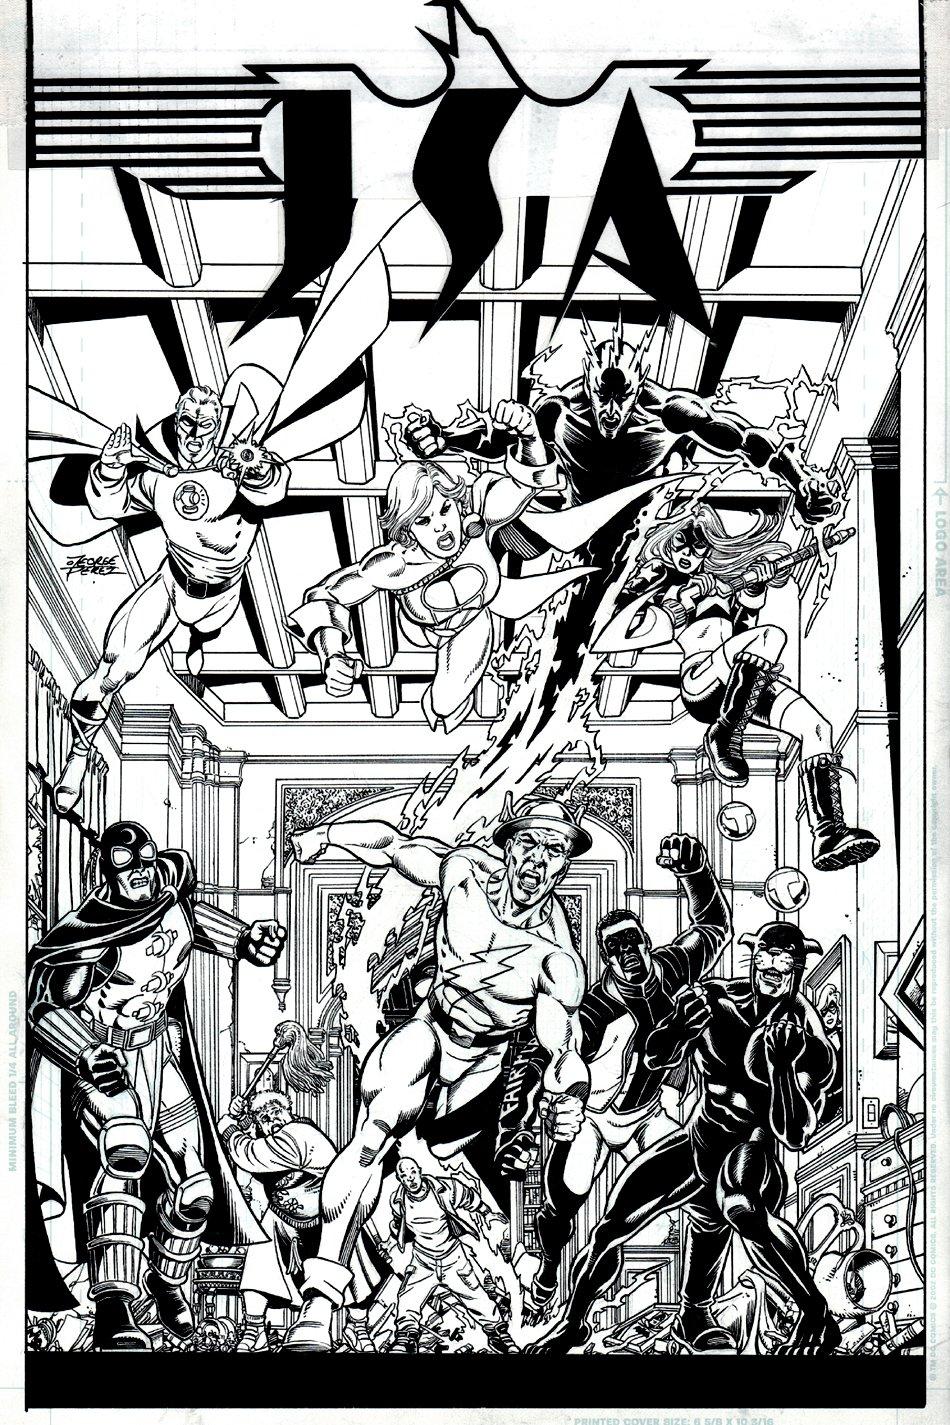 JSA #84 Cover (10 Heroes!) 2006